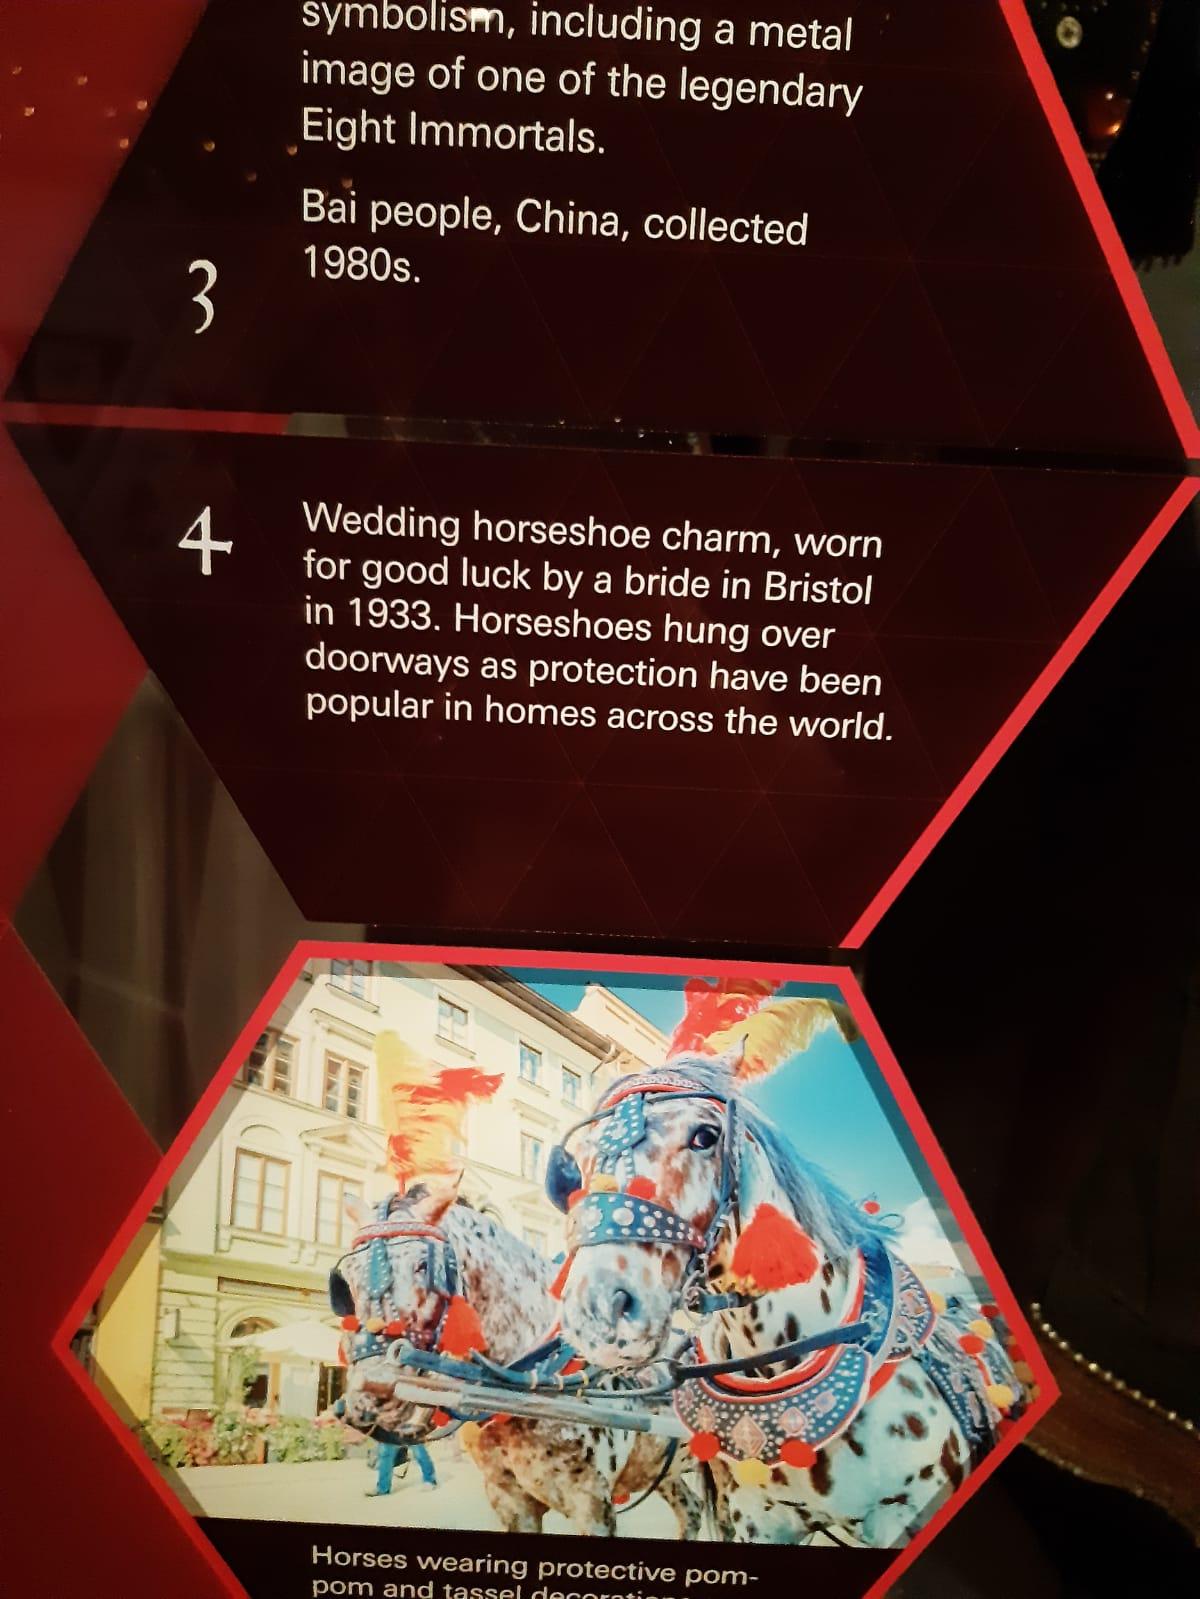 Bristol Museum of Art Gallery - esposizione: do you believe in magic? https://www.bristolmuseums.org.uk/bristol-museum-and-art-gallery/whats-on/magic/